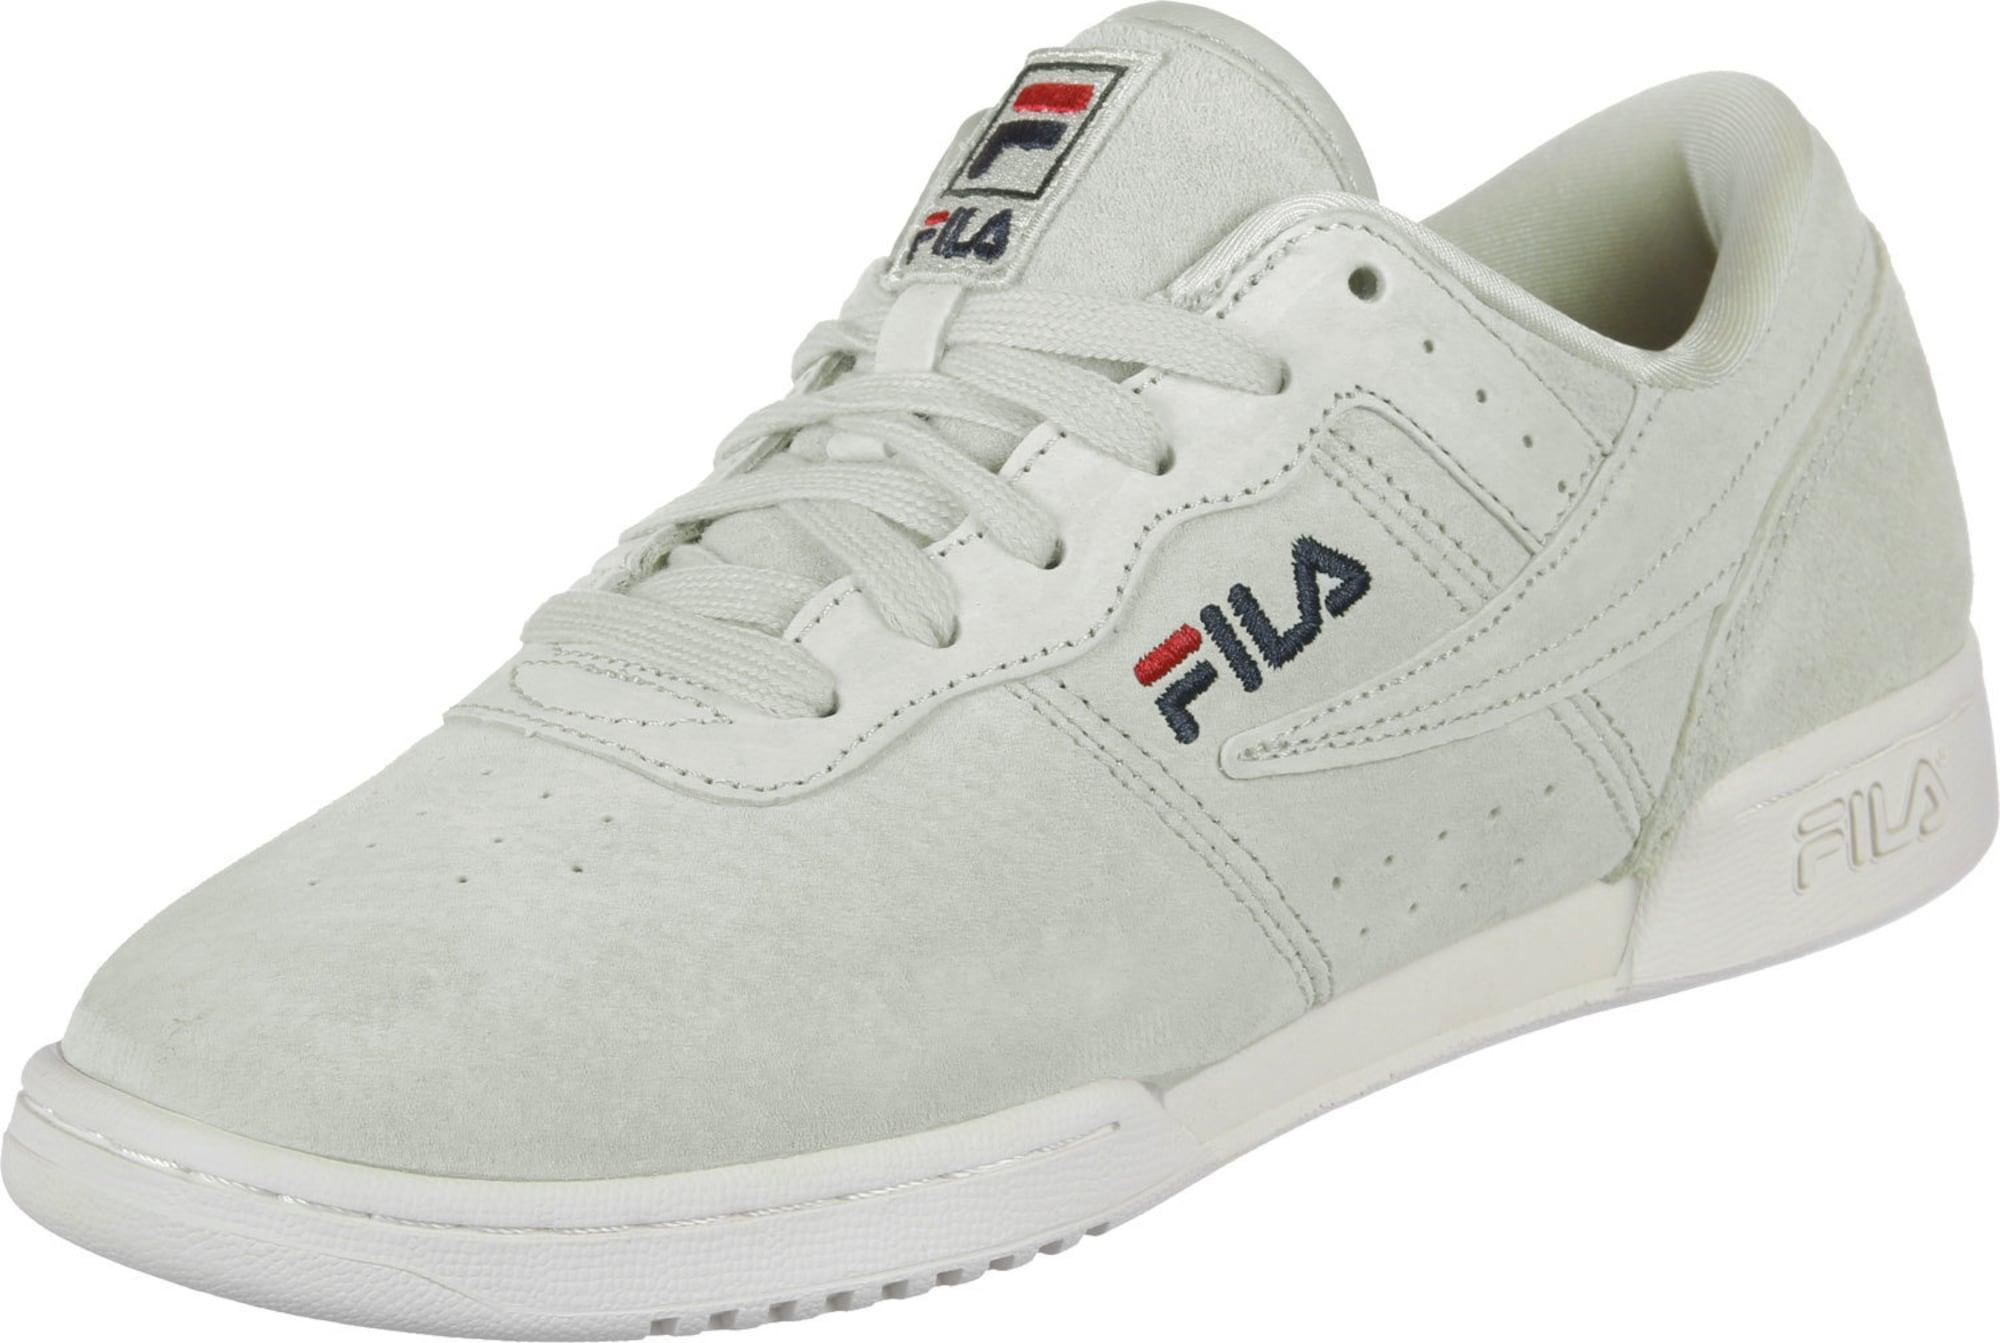 FILA Chaussure de sport 'Original Fitness S'  - Gris - Taille: 38.5 - female